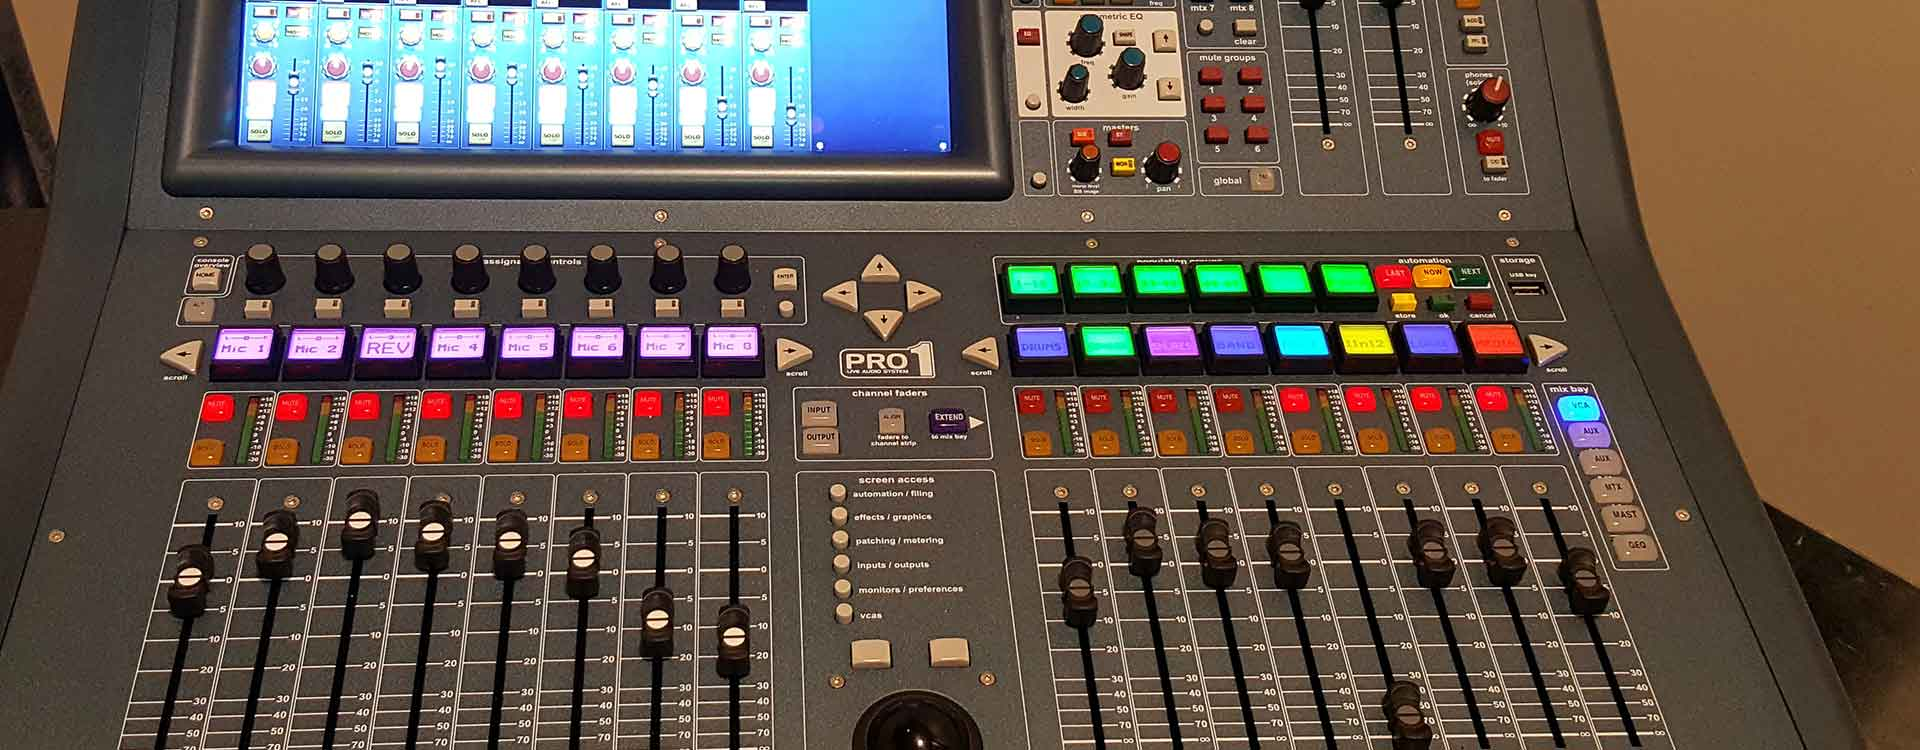 Picture of audio control board